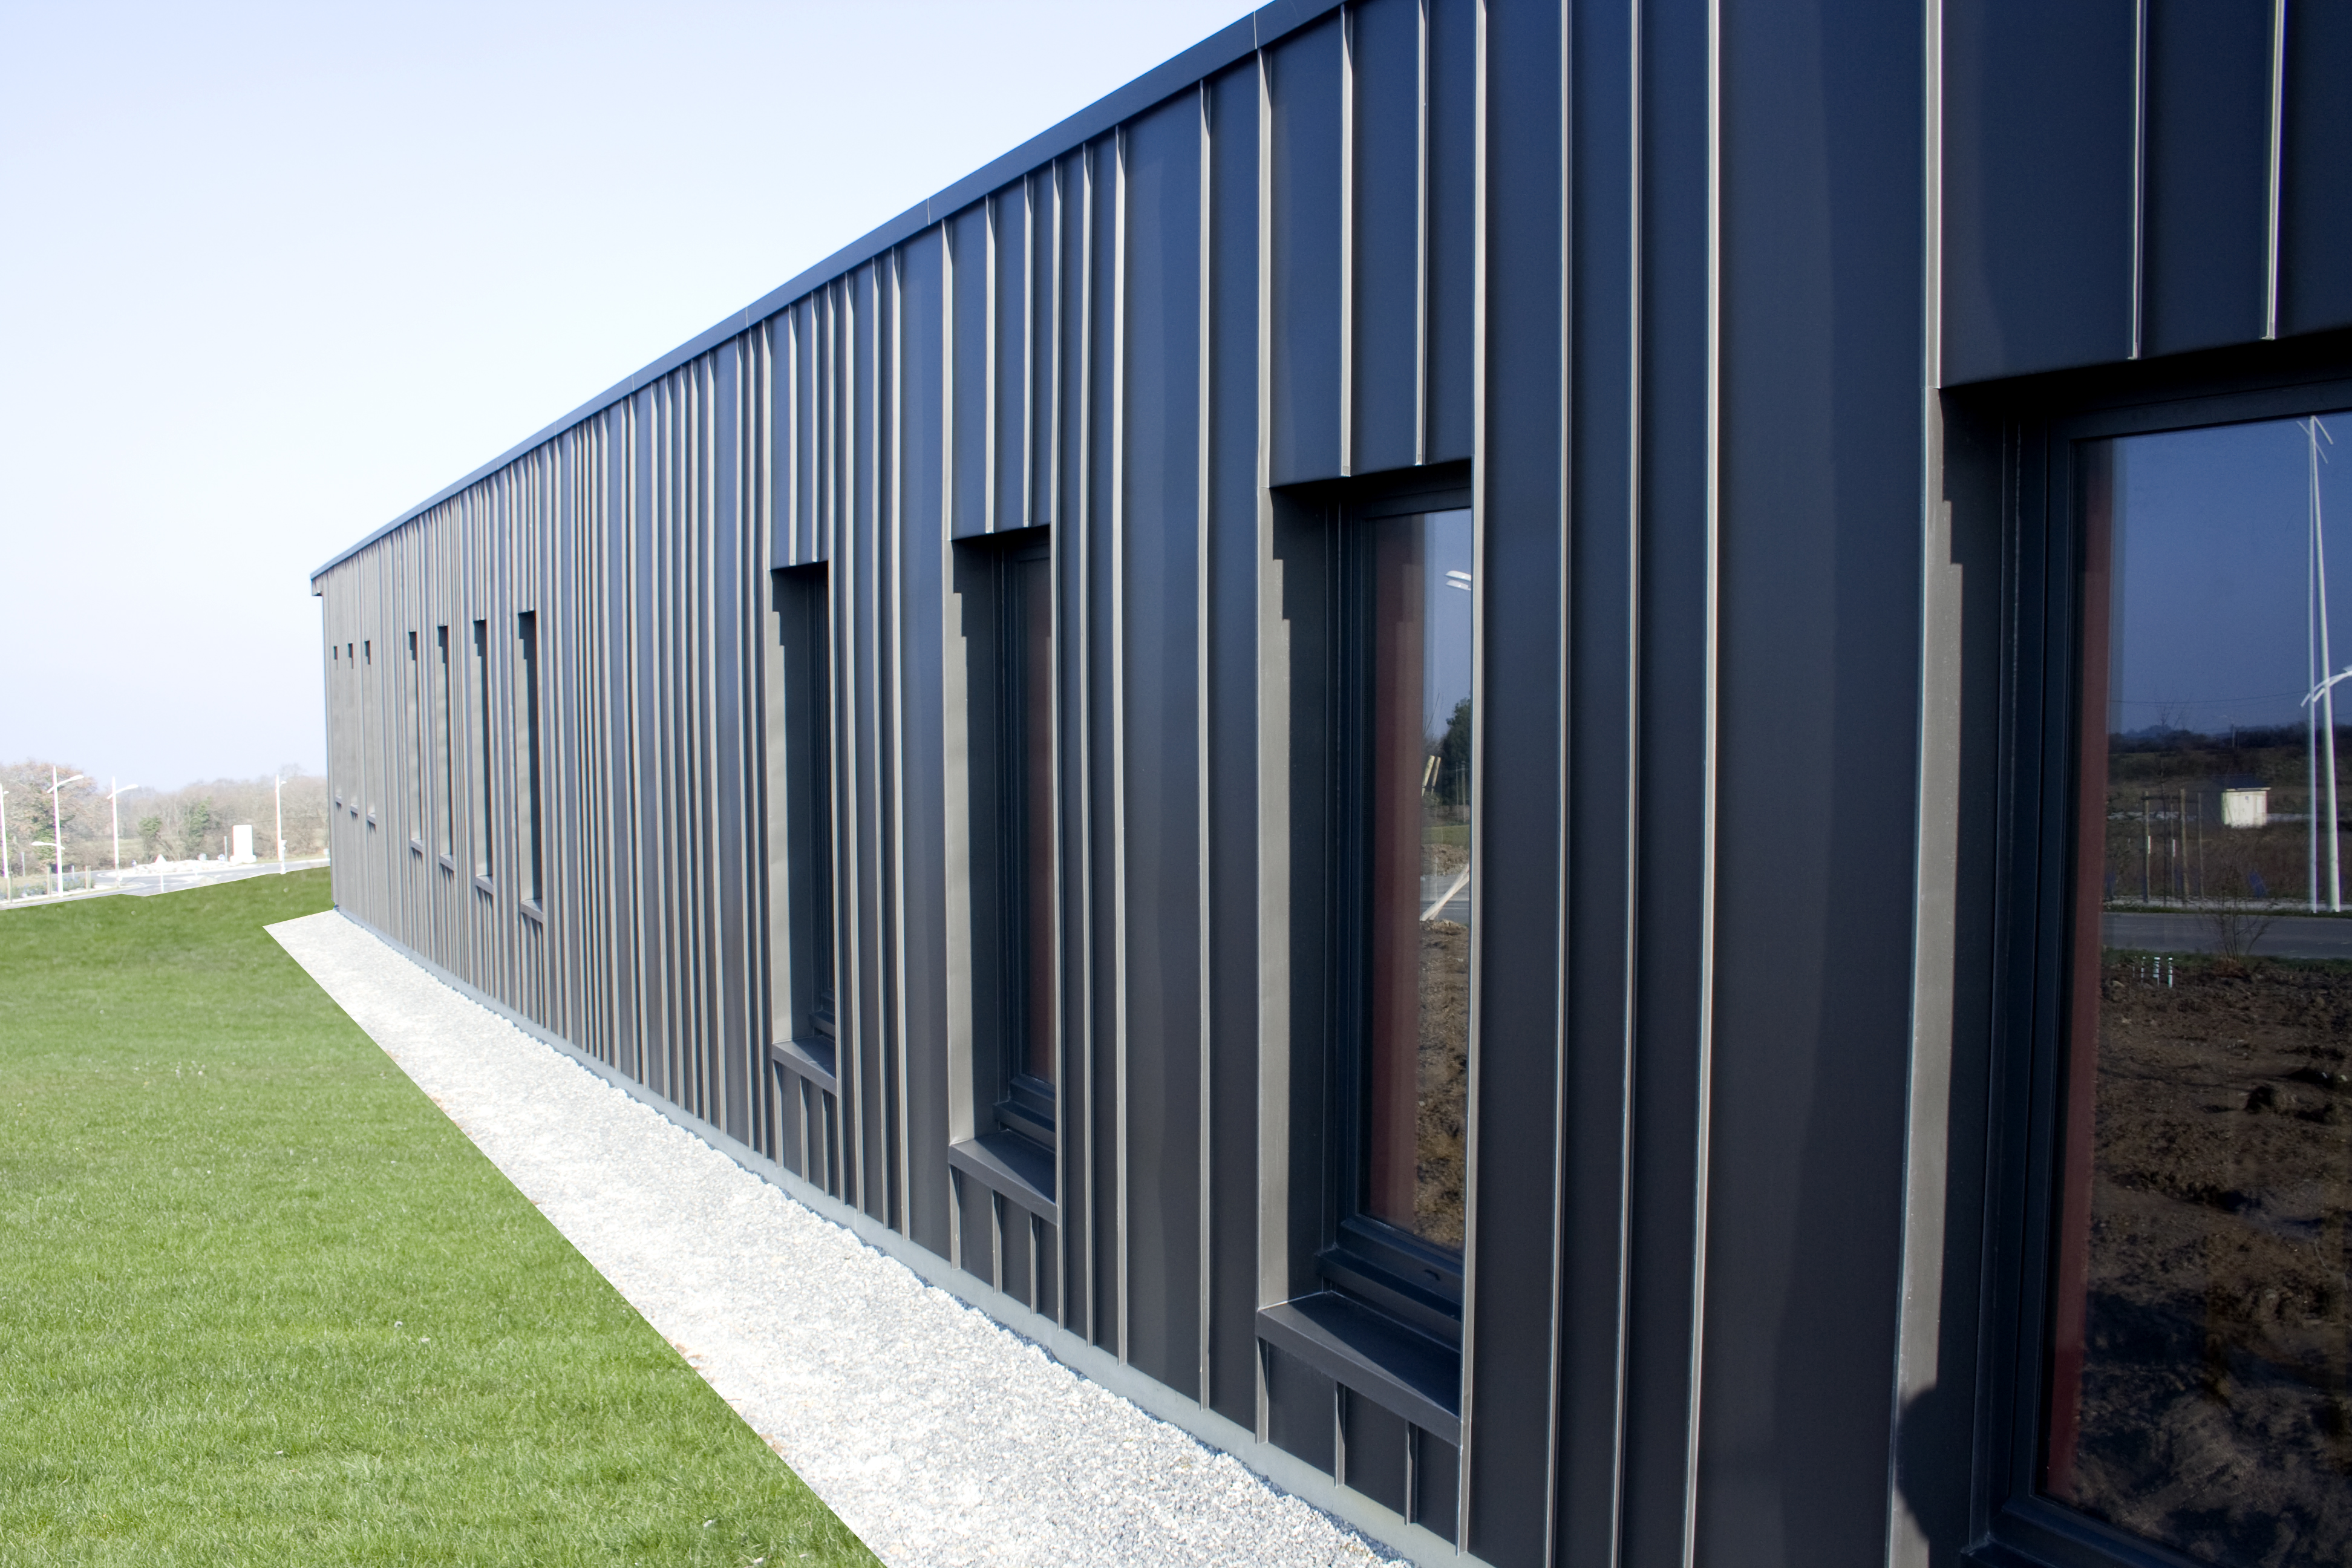 Couverture magu ro couverture et bardage zinccouverture for Garage aggiunta piani 2 piani